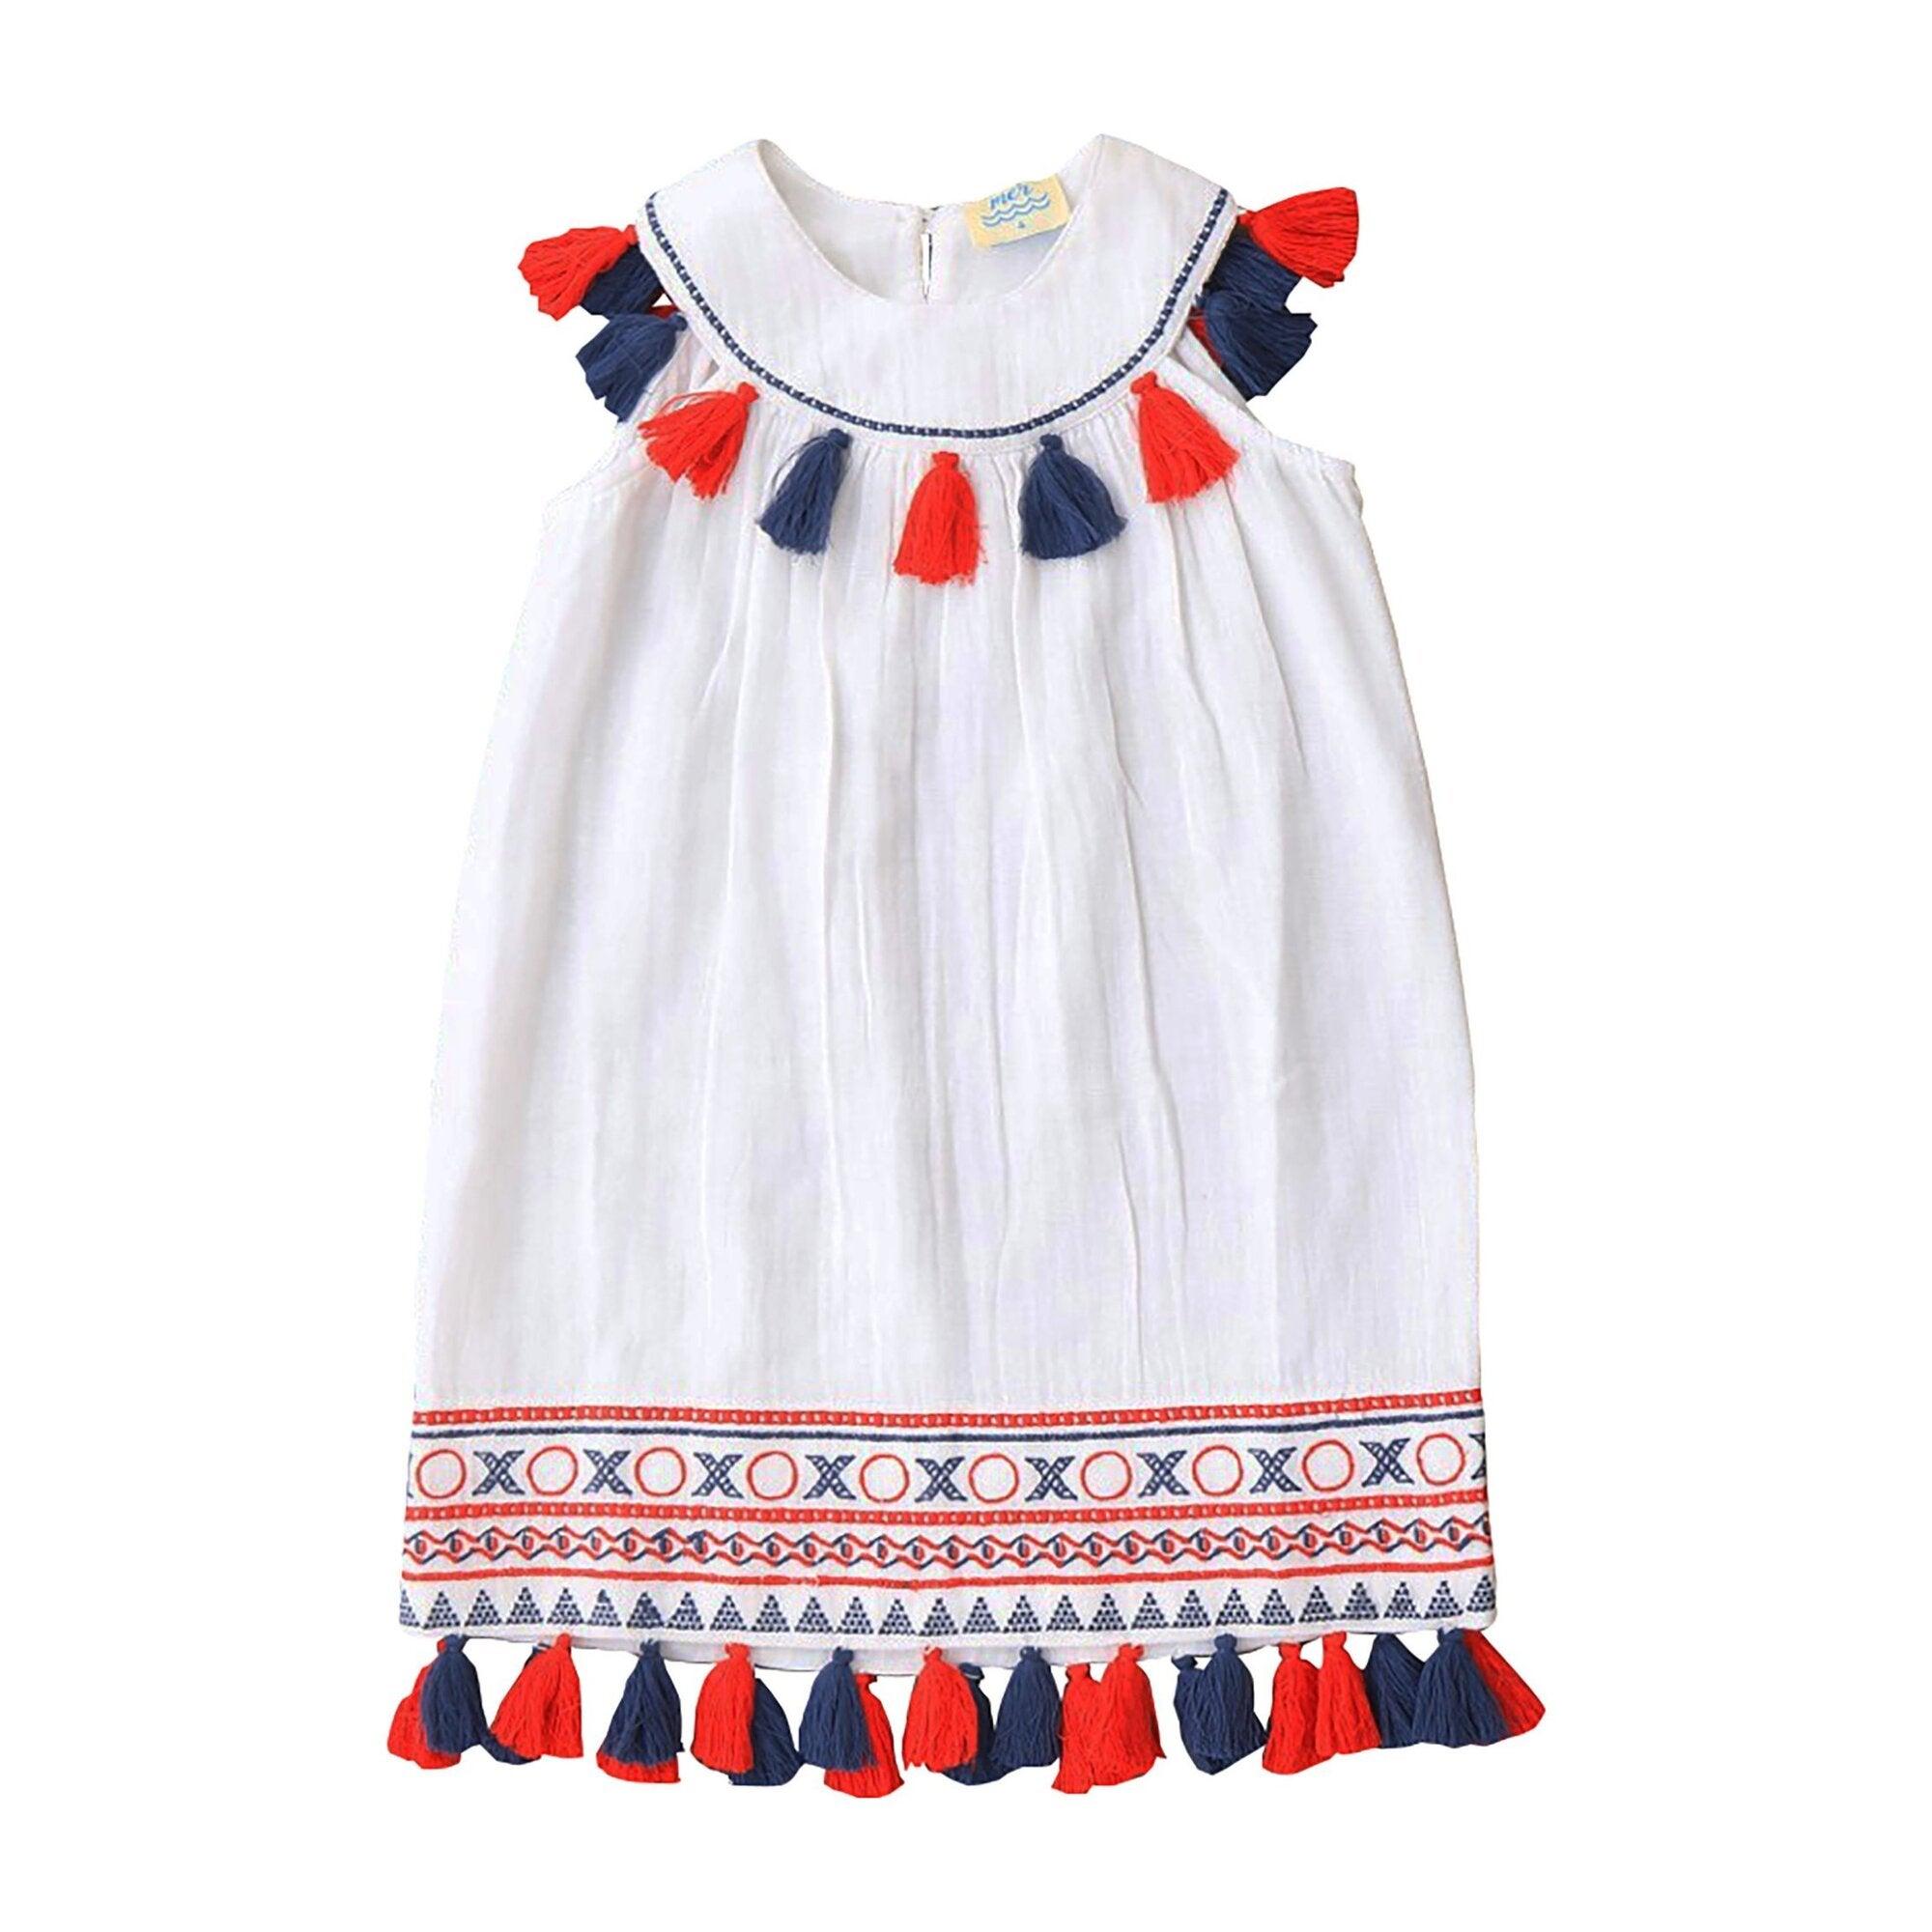 Katrina Dress, Red, White & Blue